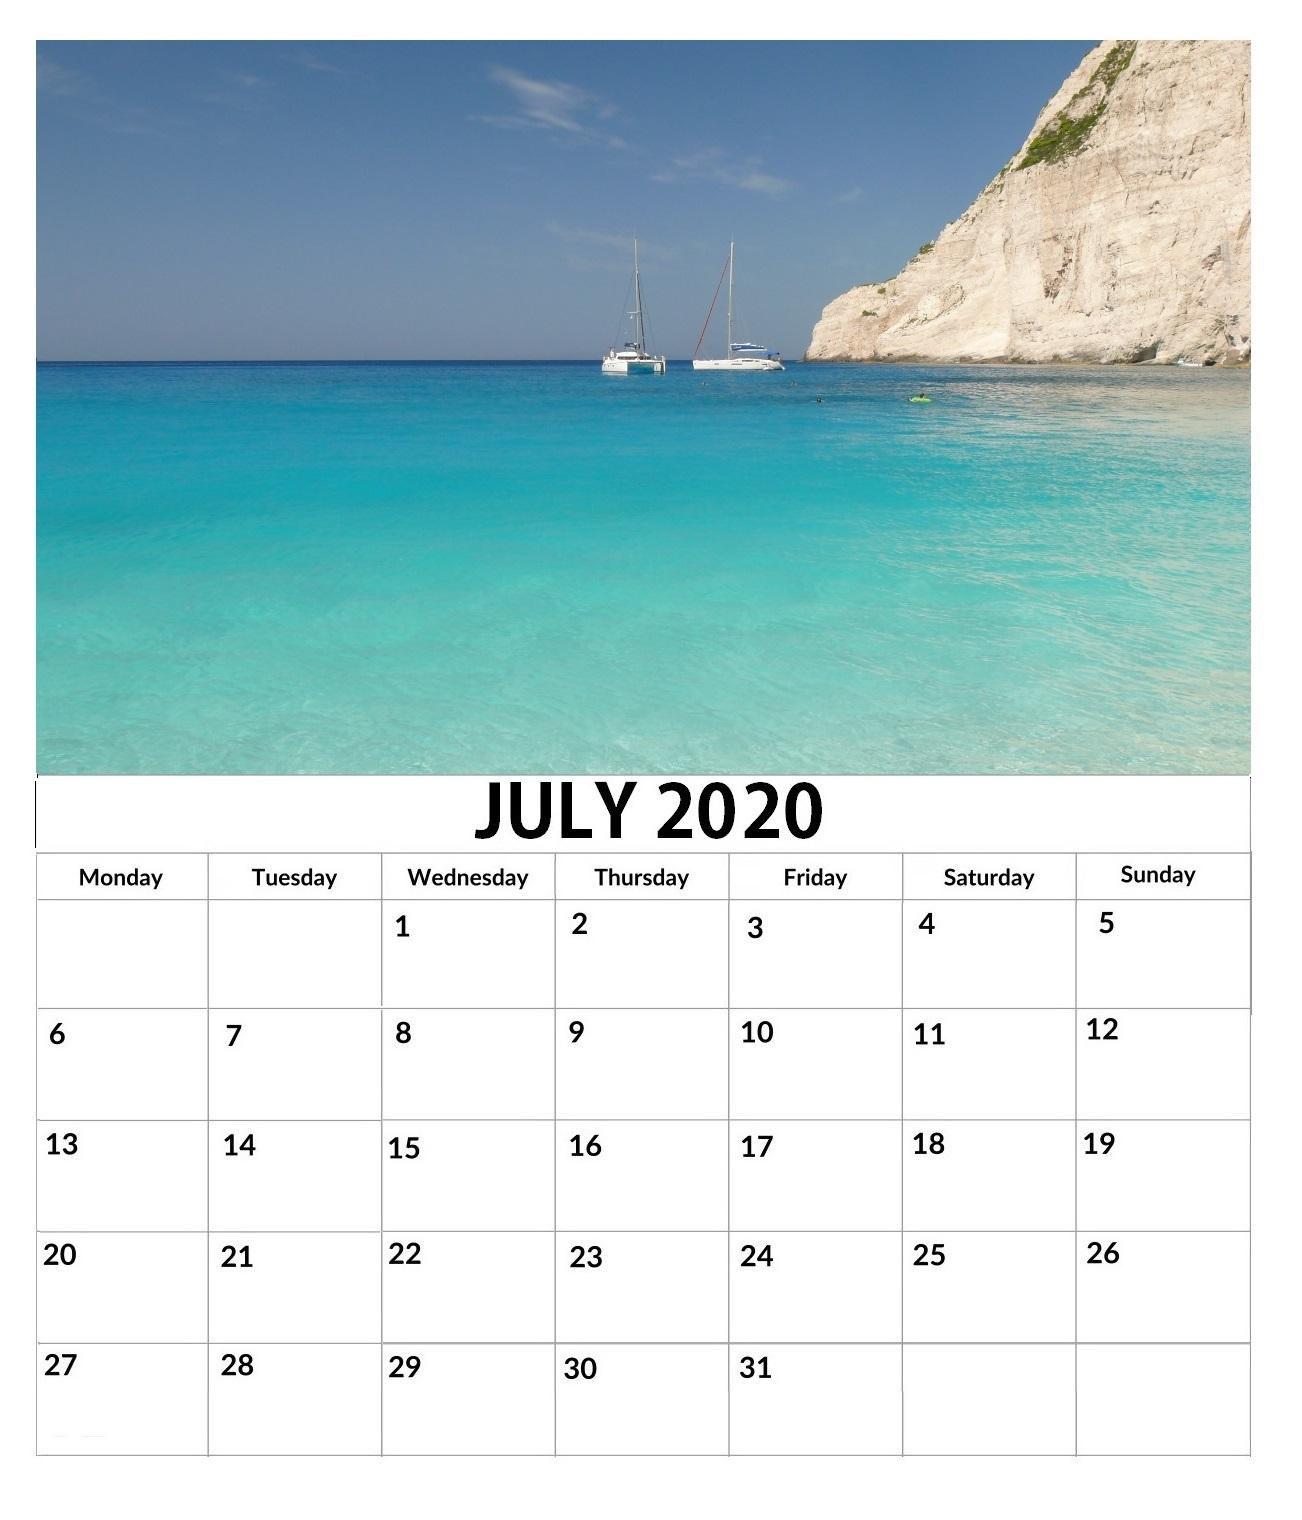 Free July 2020 Wall Calendar